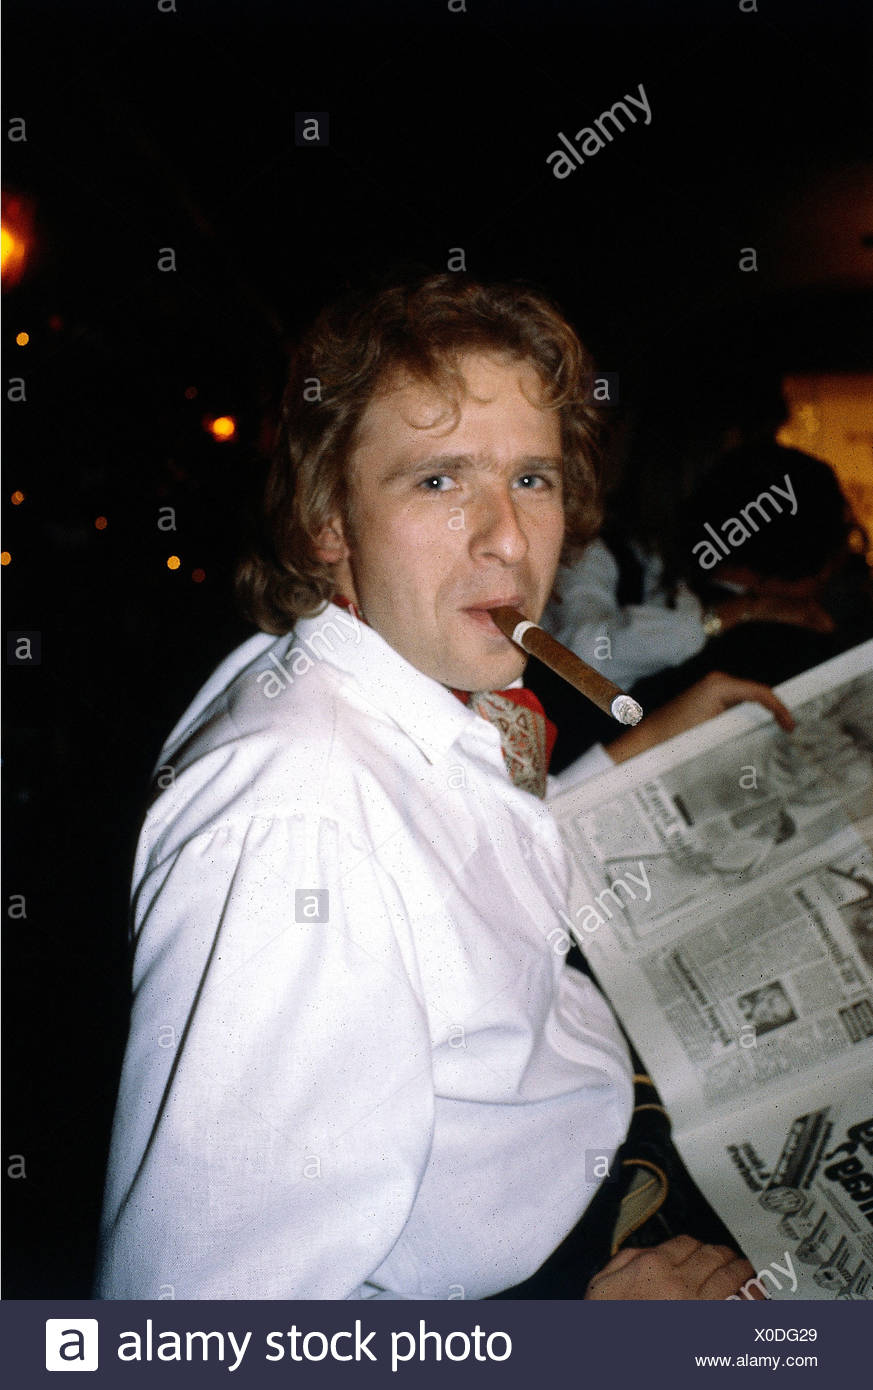 Gottschalk, Thomas, * 18.5.1950, German TV host, portrait, with cigar, 1980s, smoking, smoker, smokers, - Stock Image